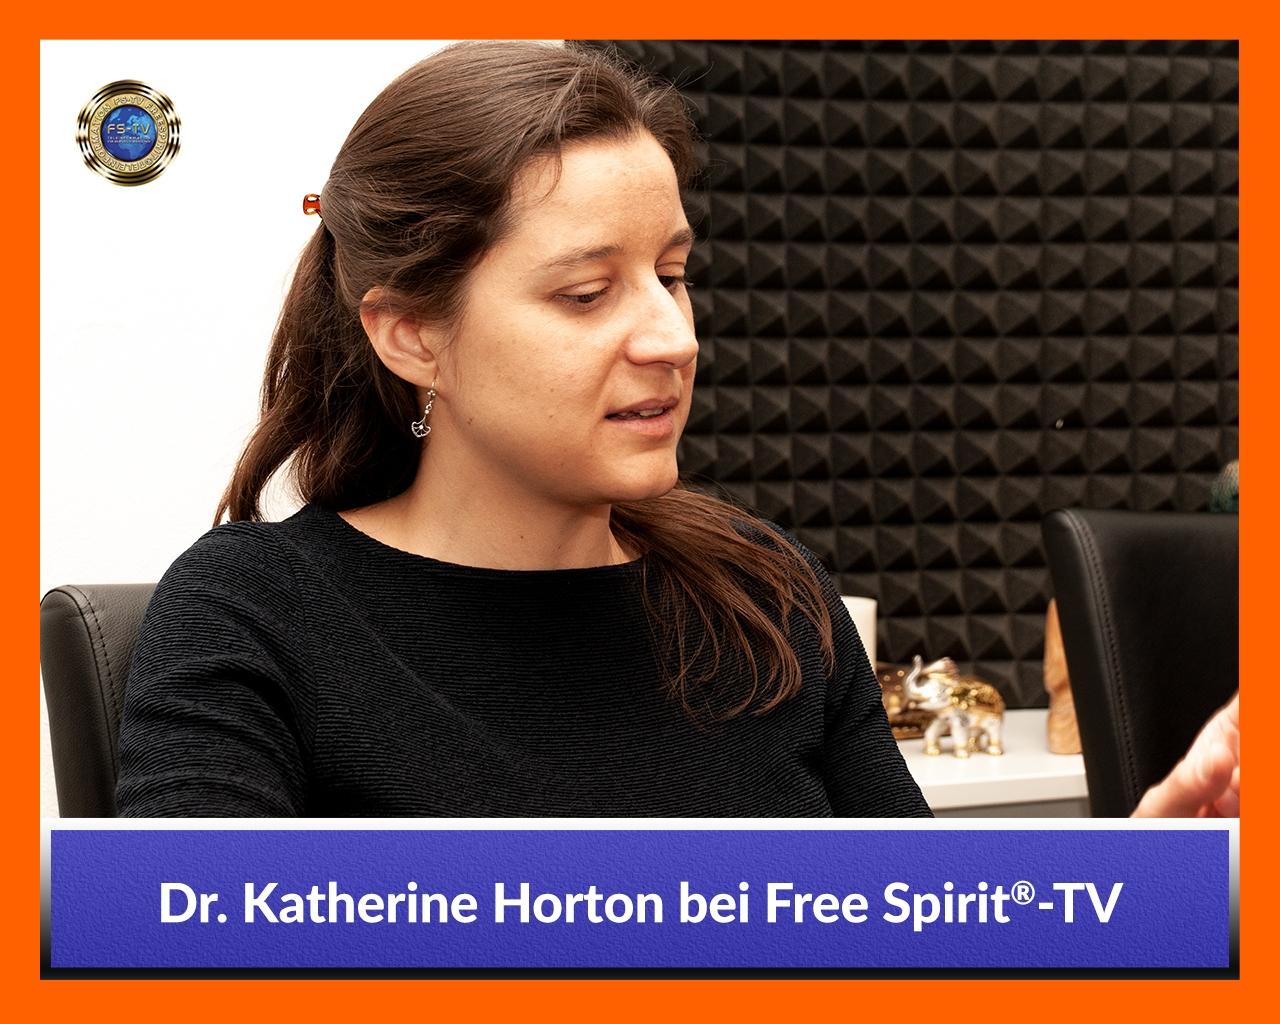 Galleriebild-Dr.Katherine-Horton-4